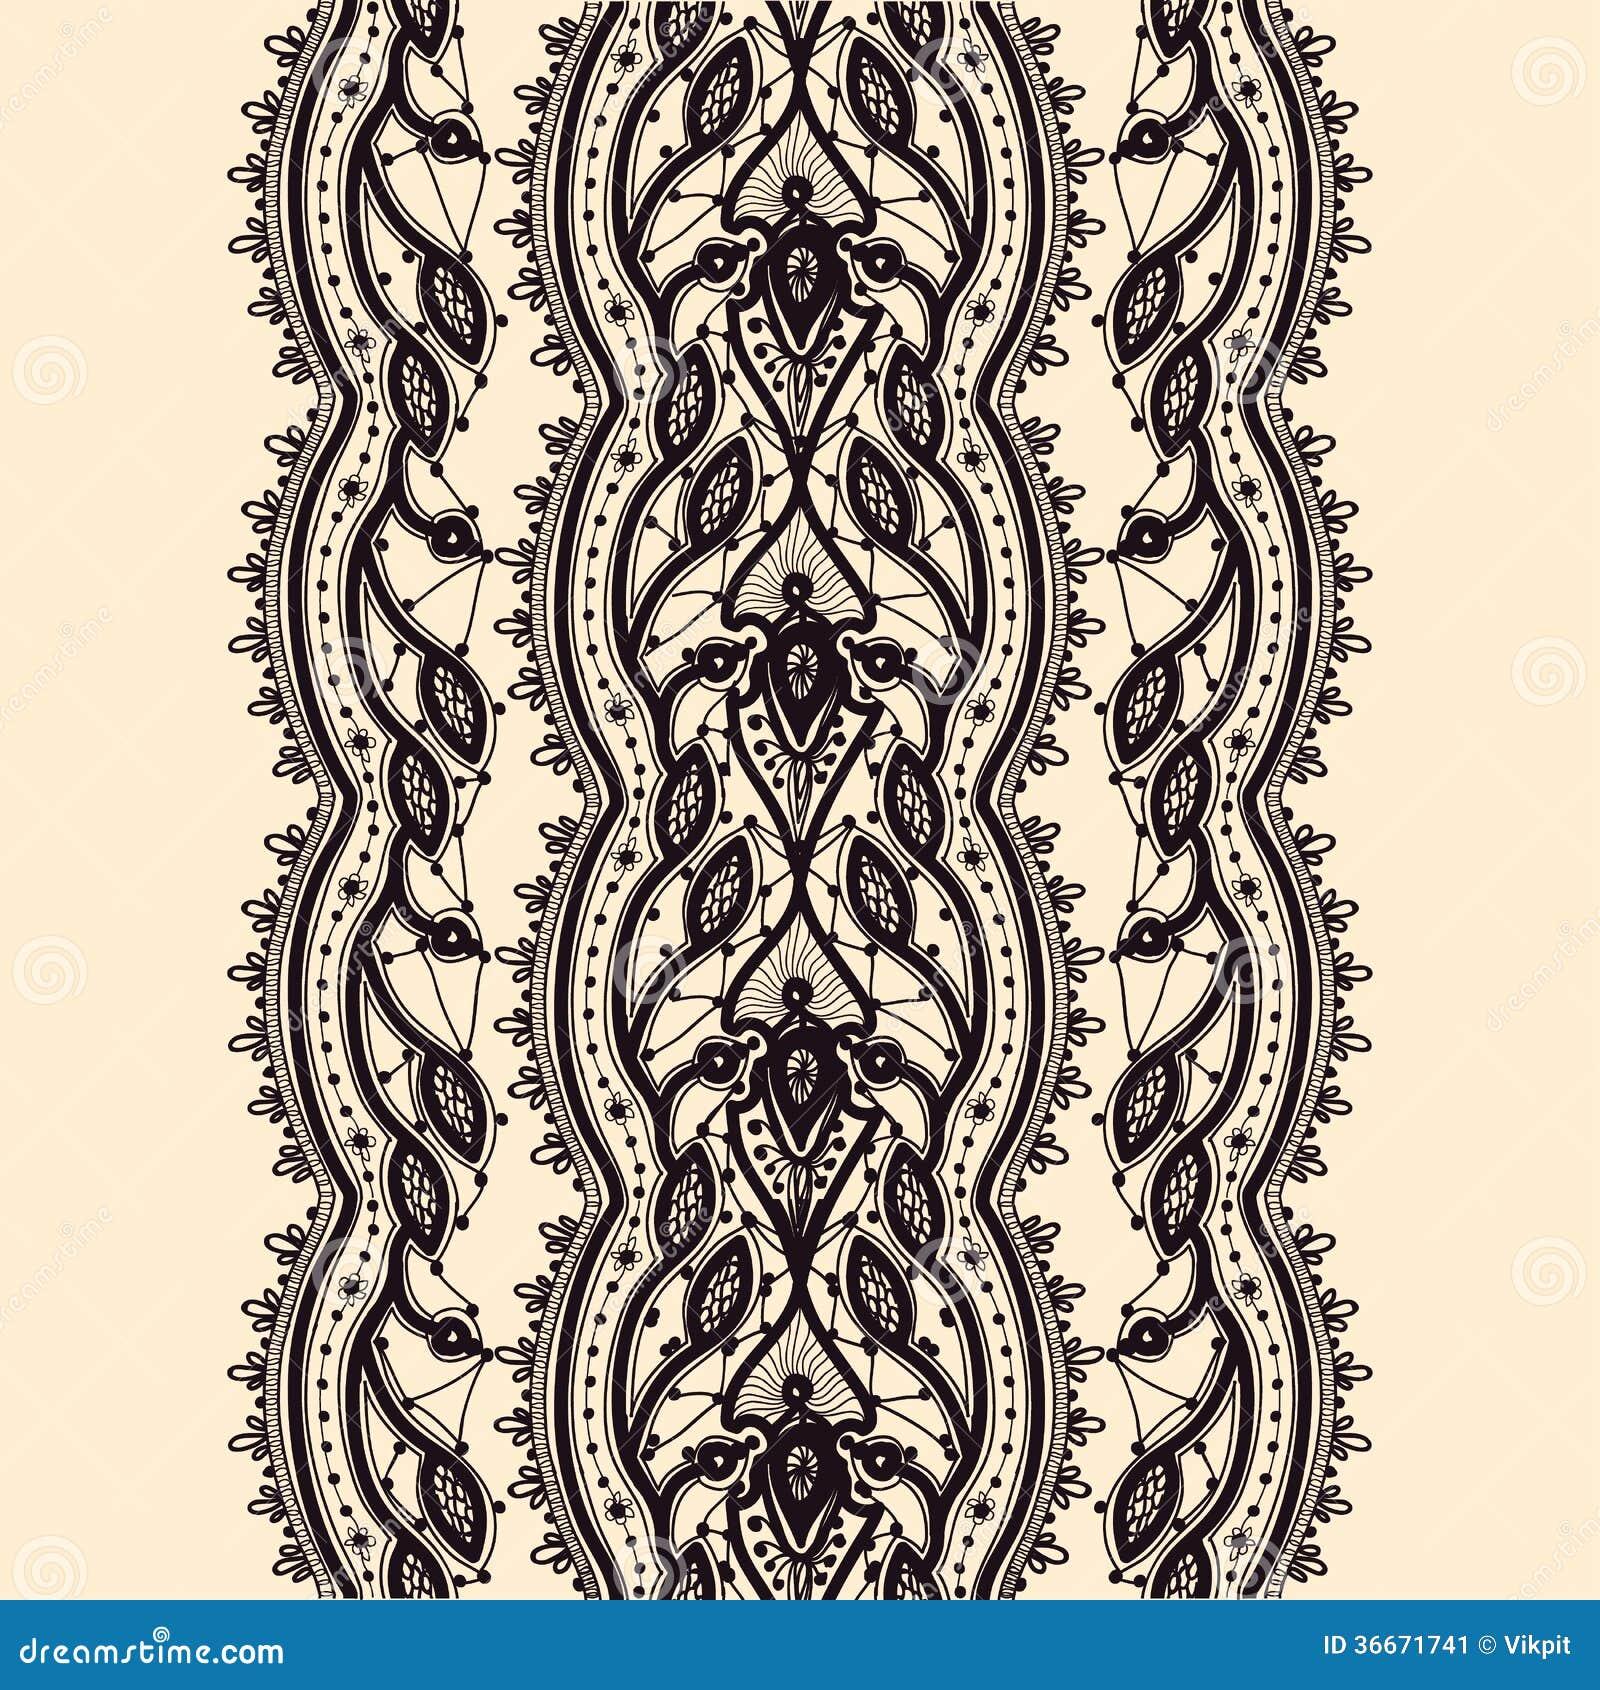 Картина абстрактной ленты шнурка безшовная.